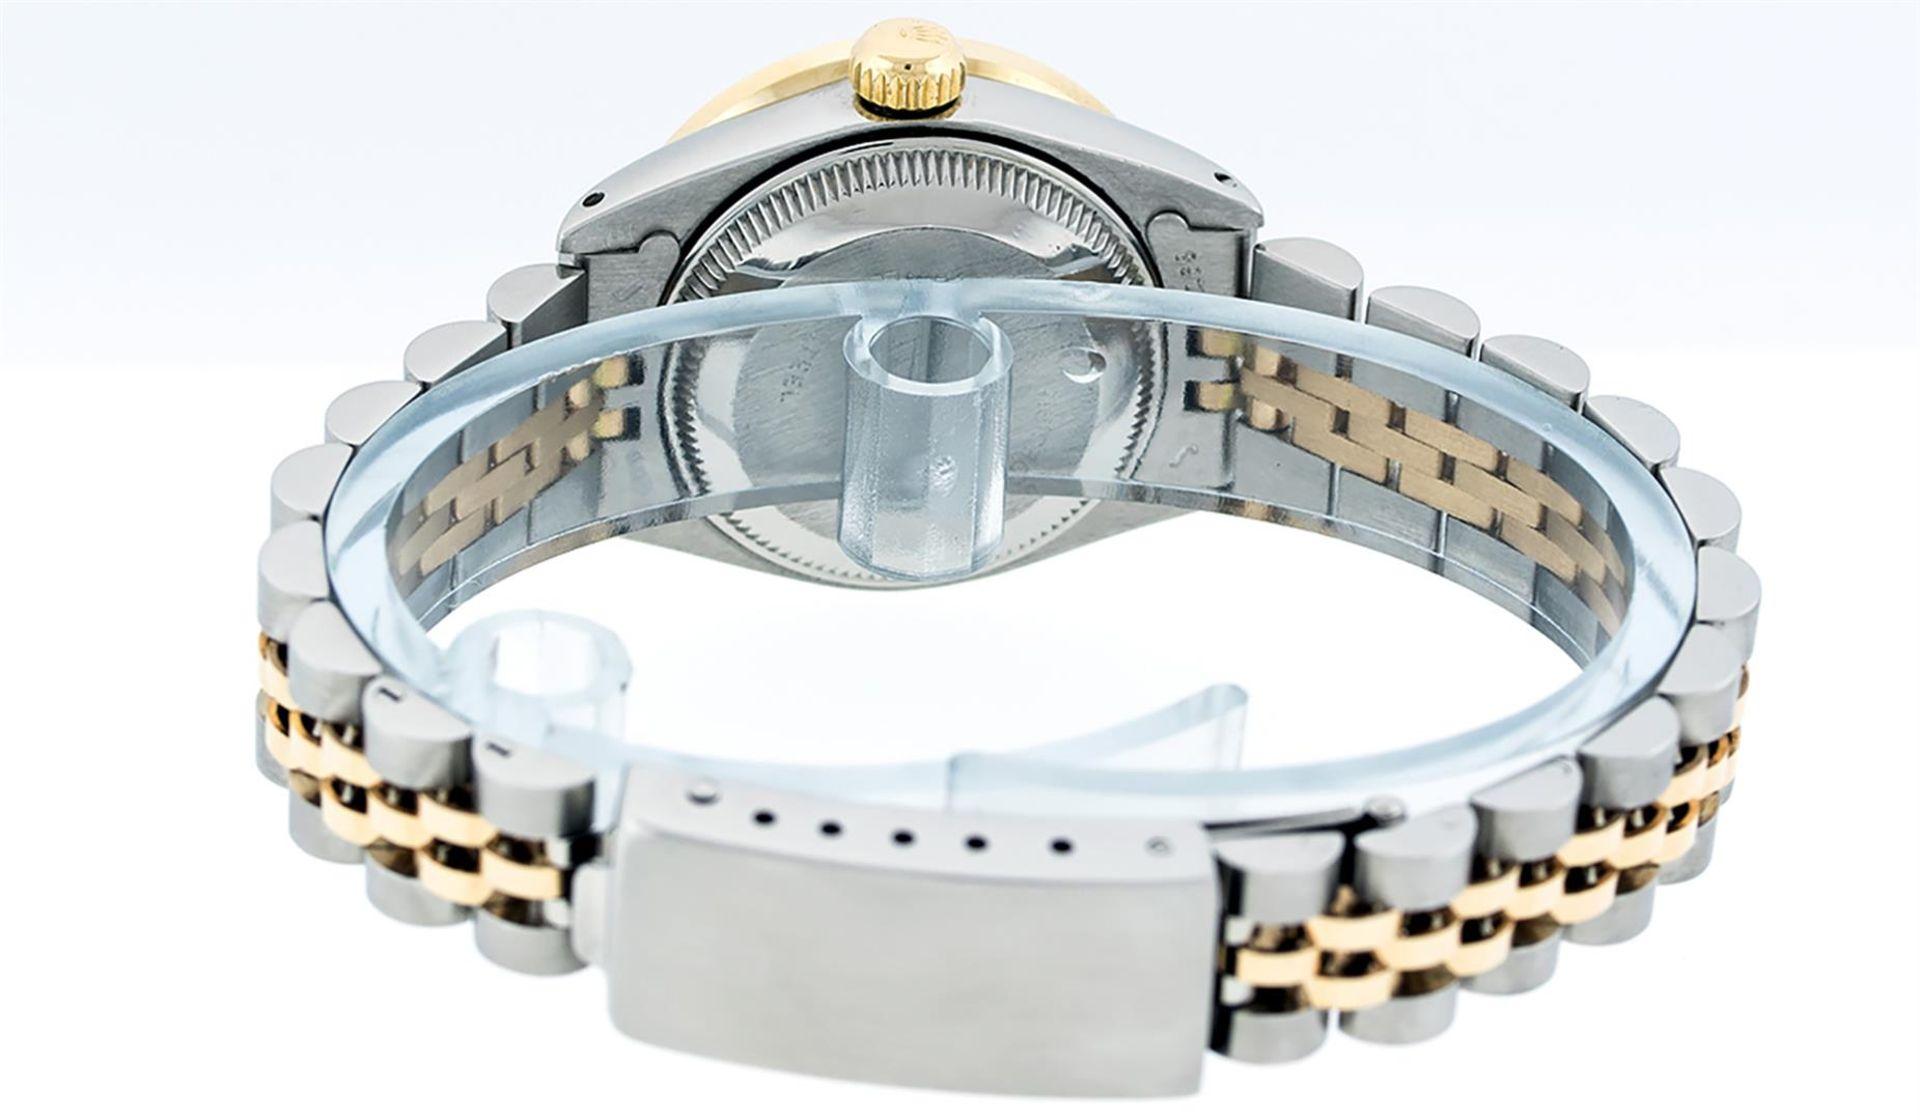 Rolex Ladies 26 2T Pink MOP Baguette 18K YG Diamond Bezel Serviced And Polished - Image 9 of 9